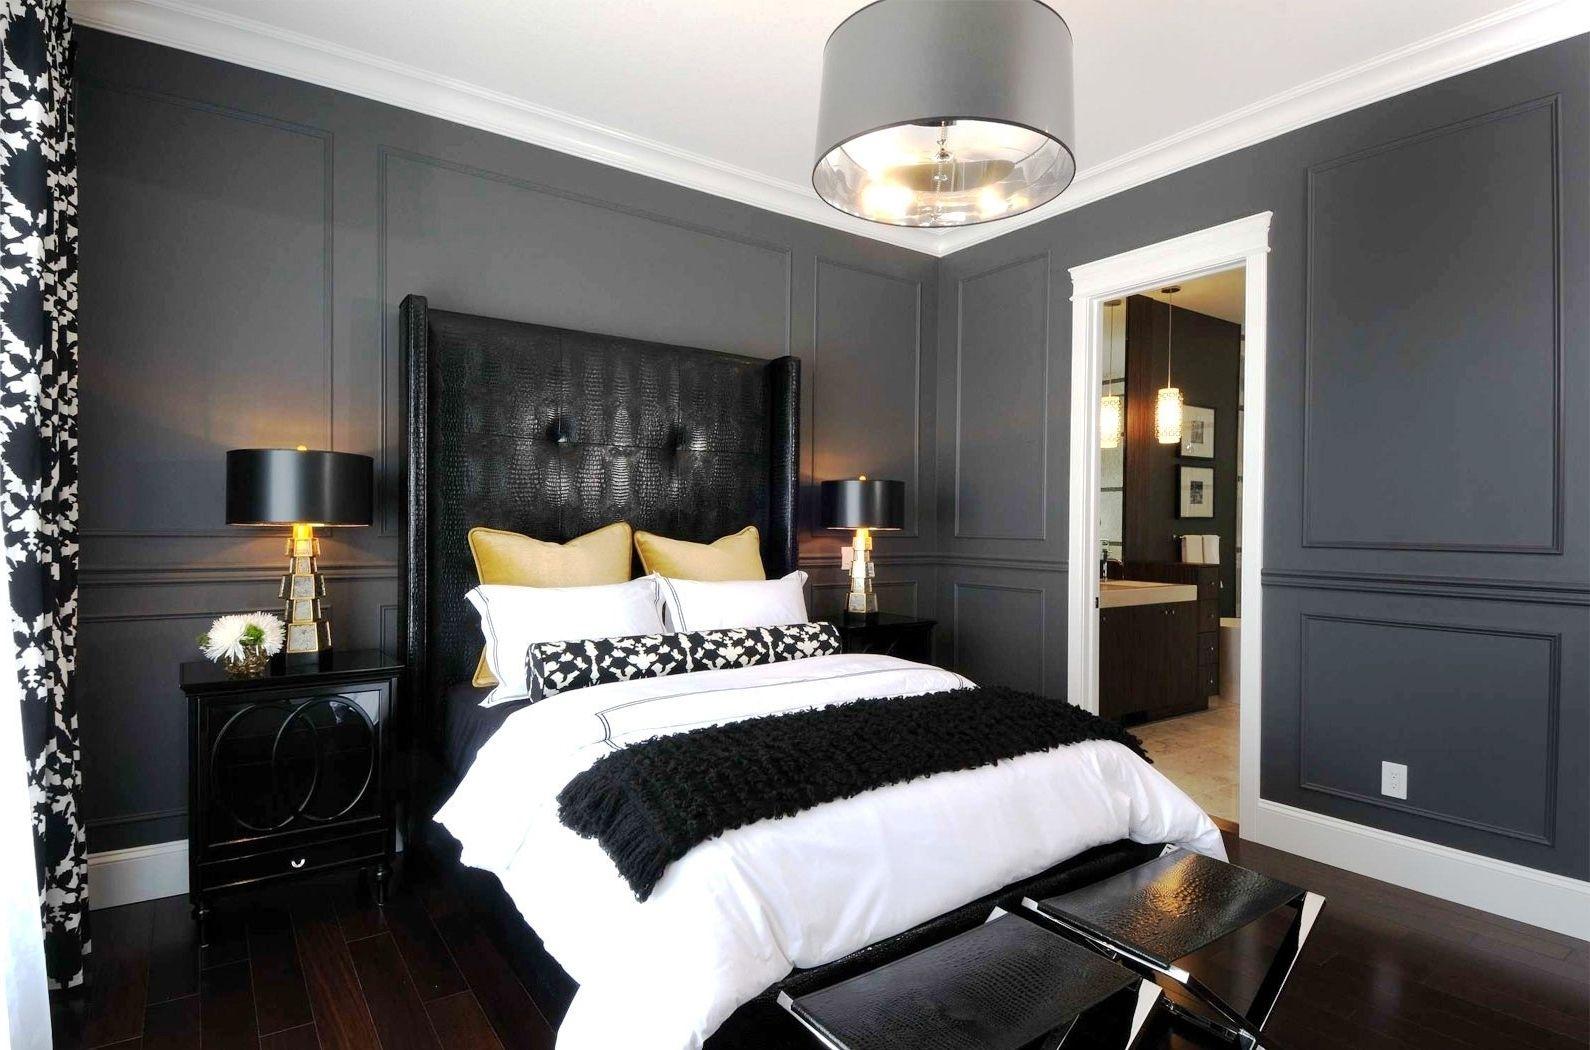 10 Modern Black And White Master Bedroom For Your Room Black